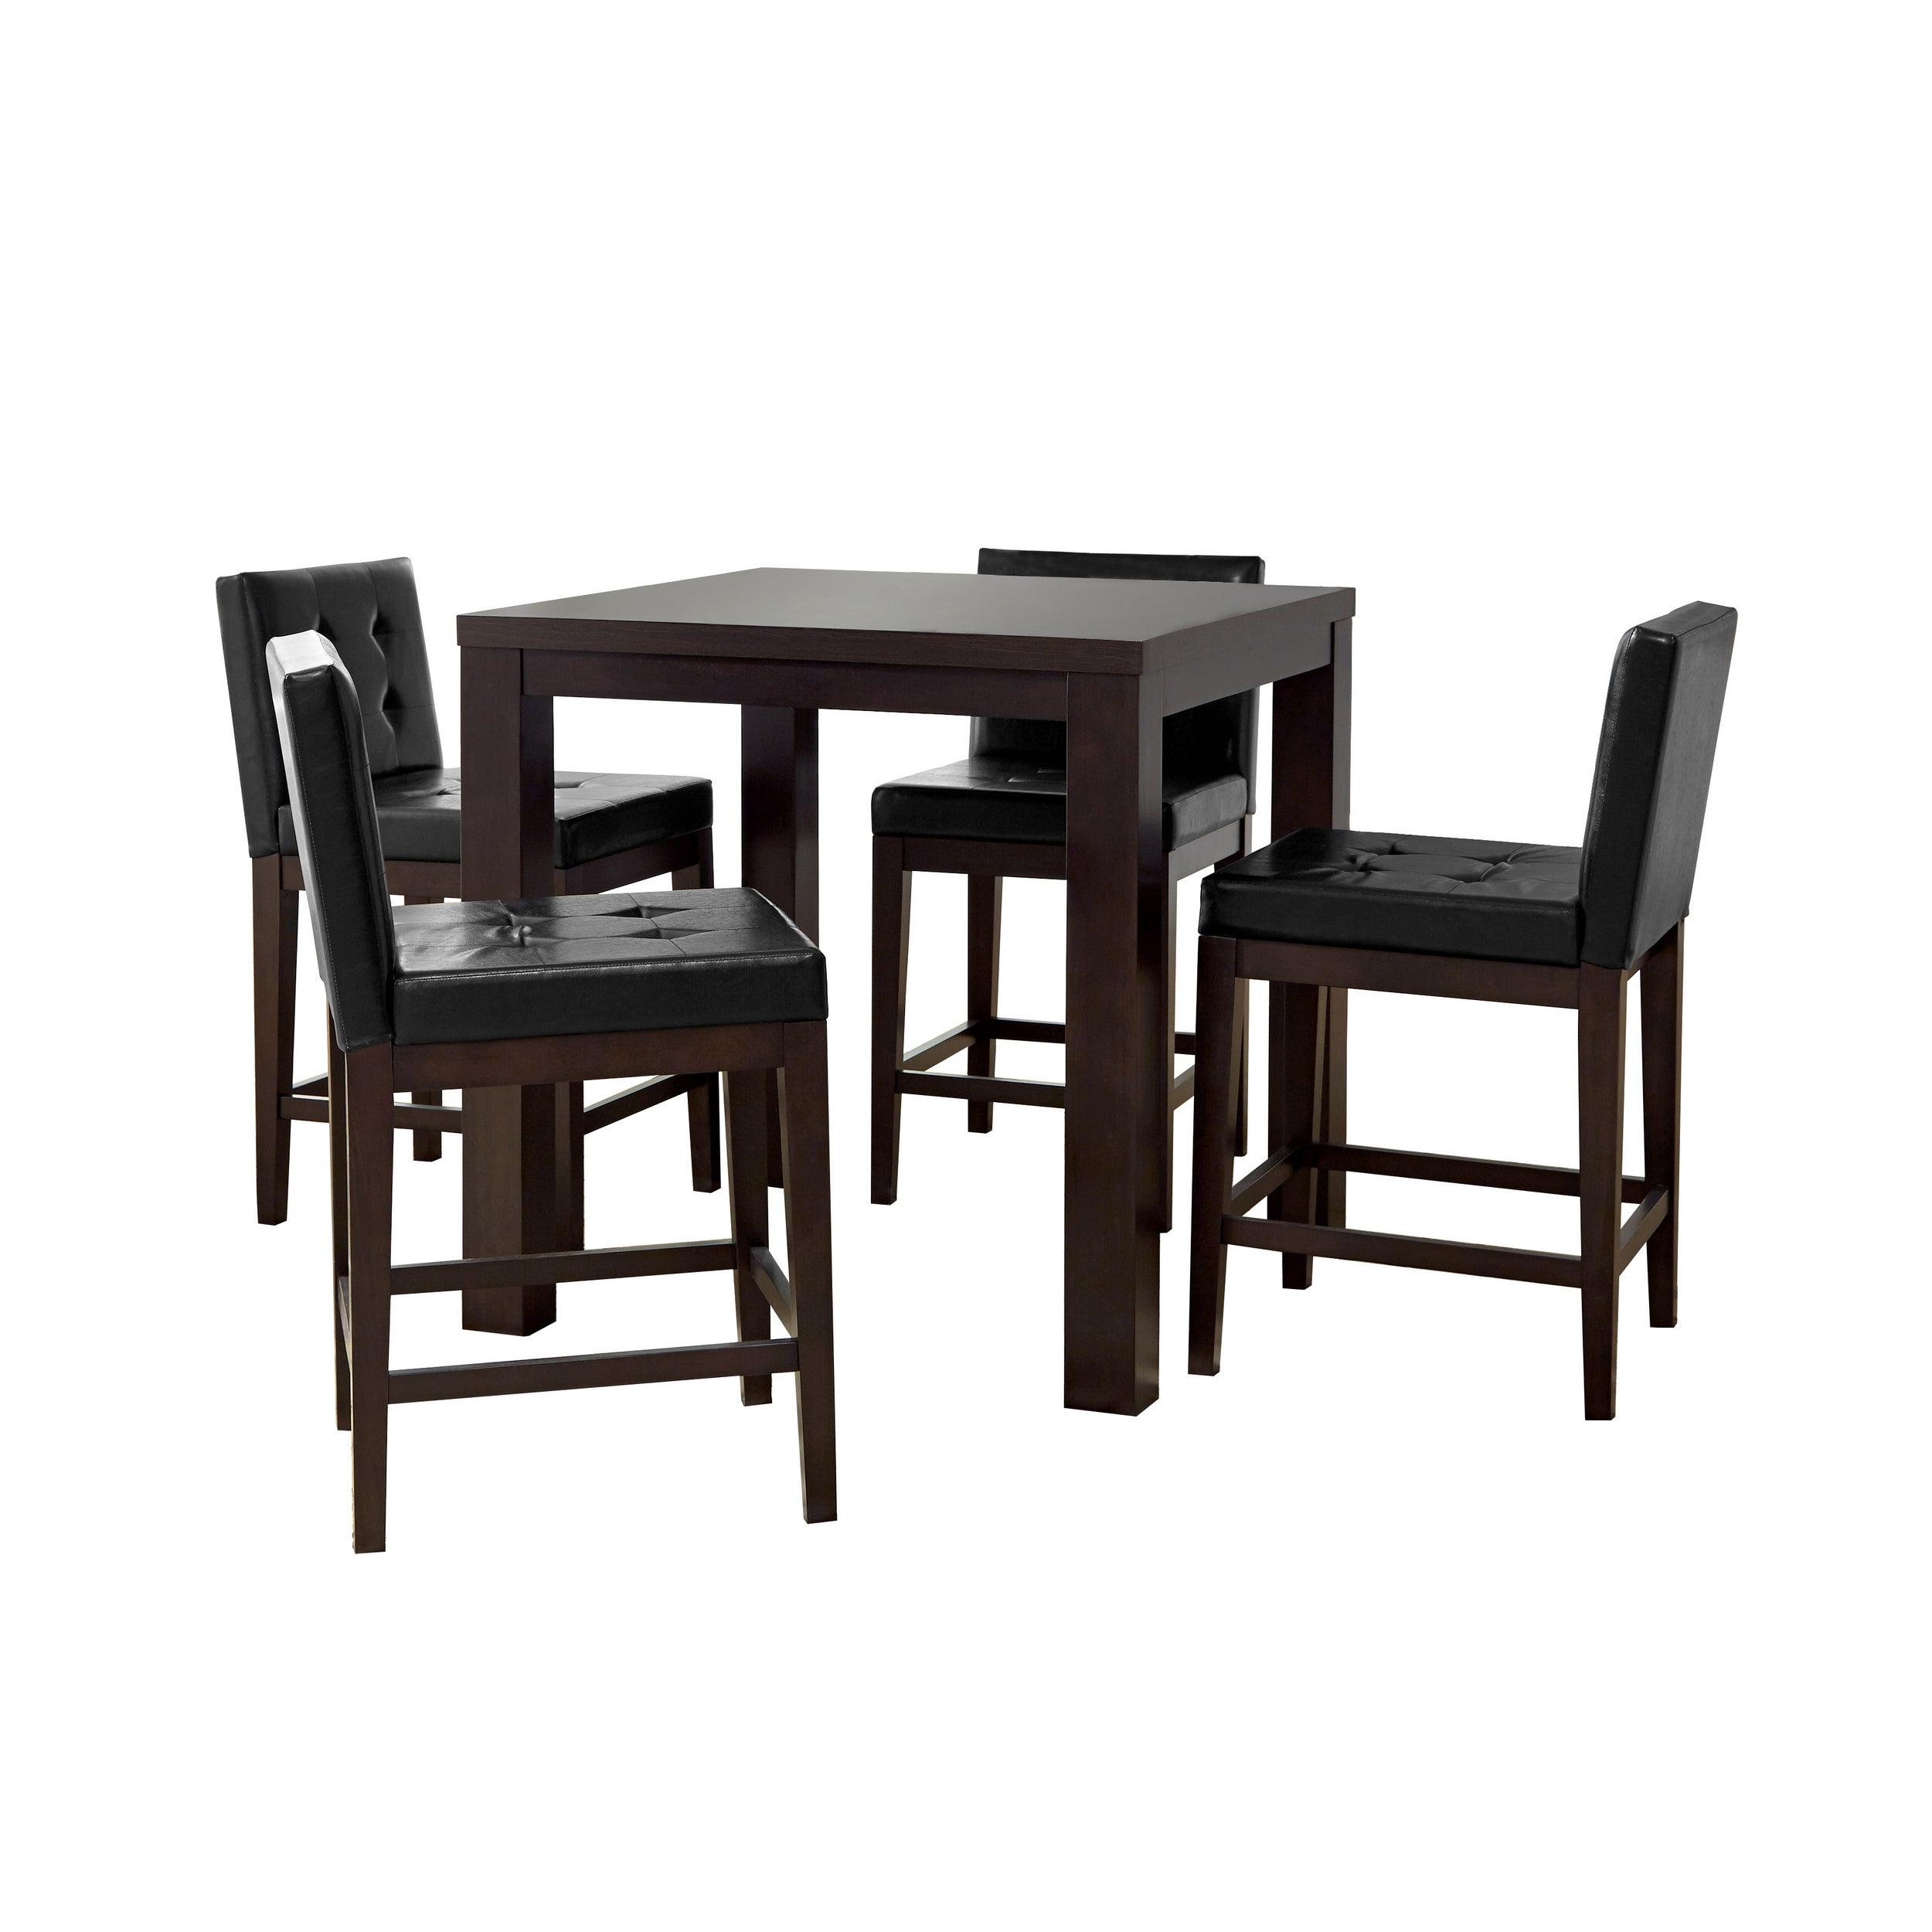 Progressive International Athena Dining Upholstered Chair...